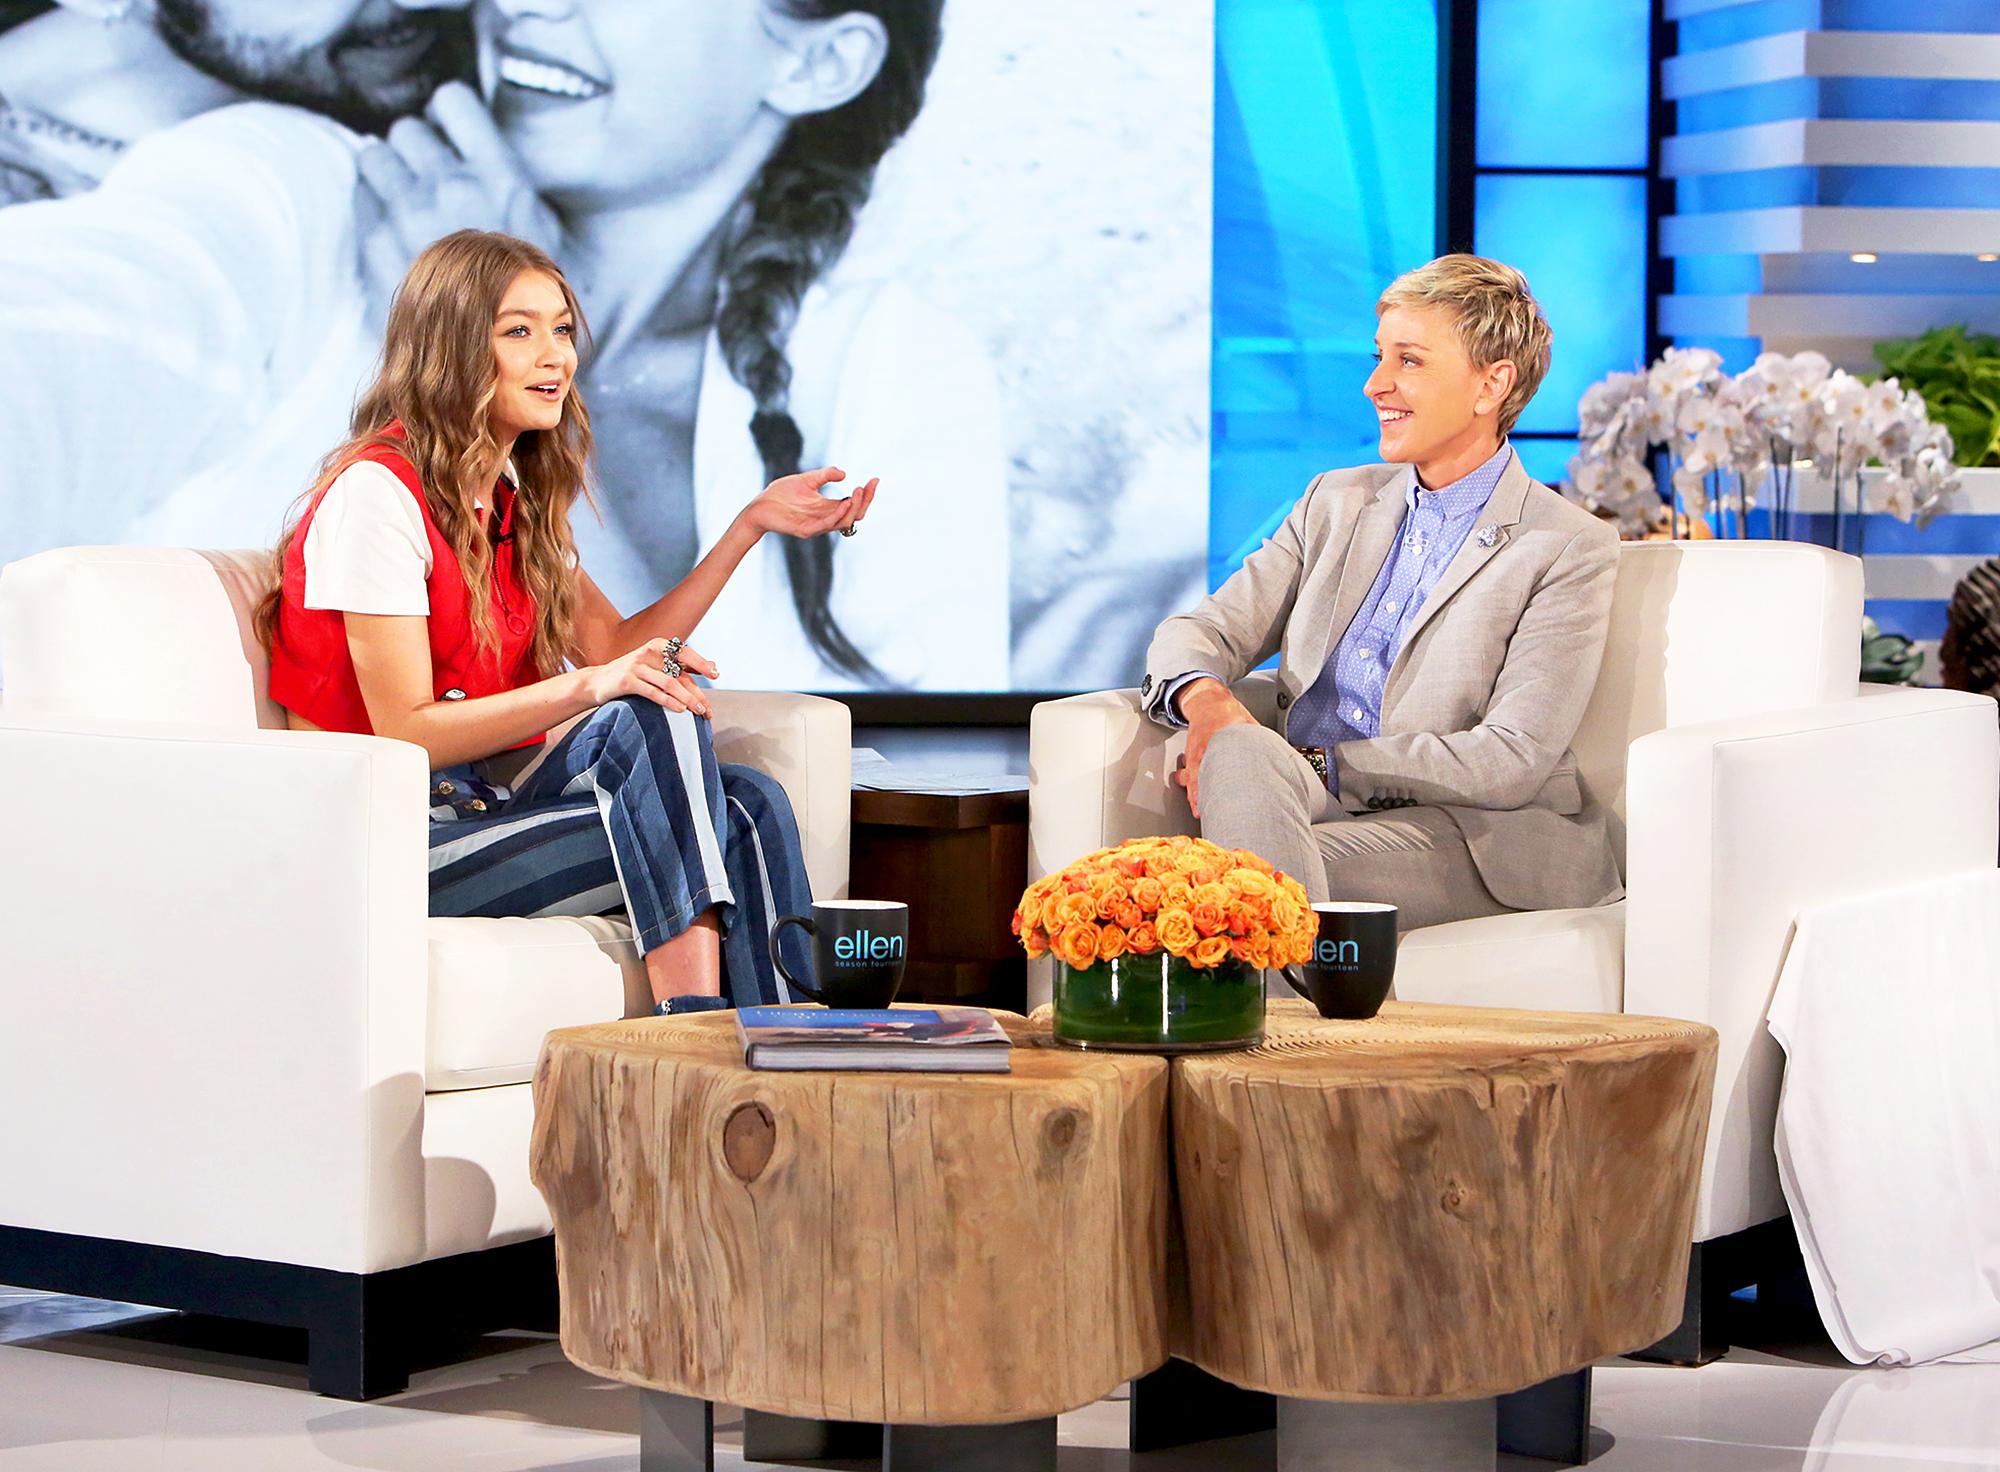 Gigi Hadid and Ellen DeGeneres